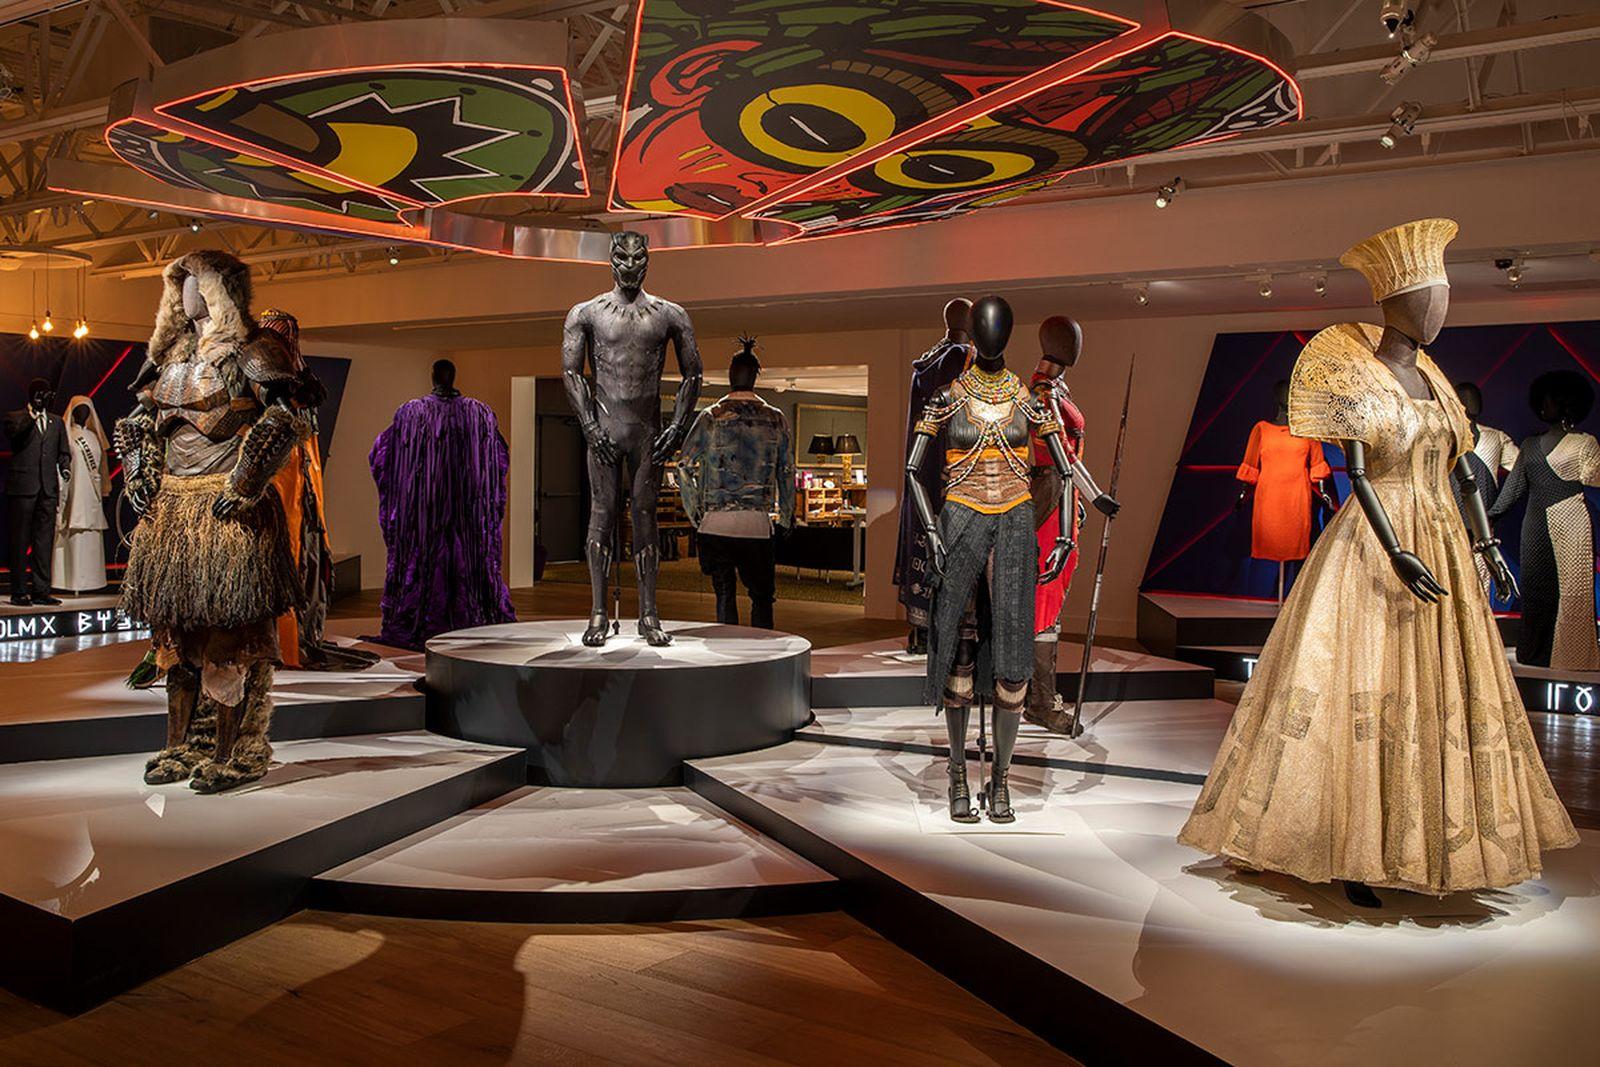 ruth-e-carters-afrofuturism-costume-design-main